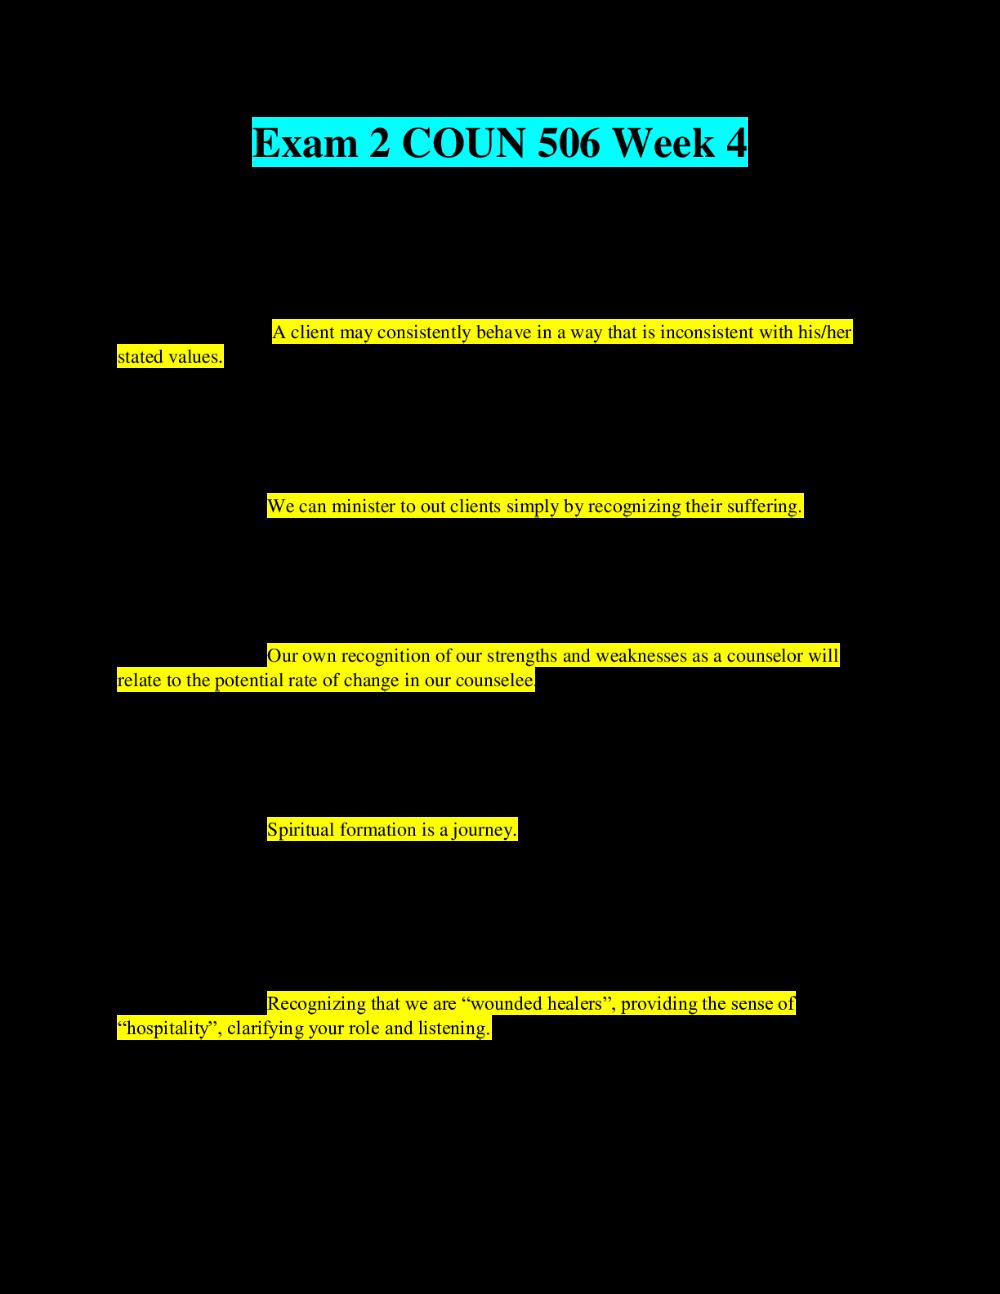 Hsco 506 Exam 2 Liberty University Complete Solution Latest Liberty University Exam Psychology Exam